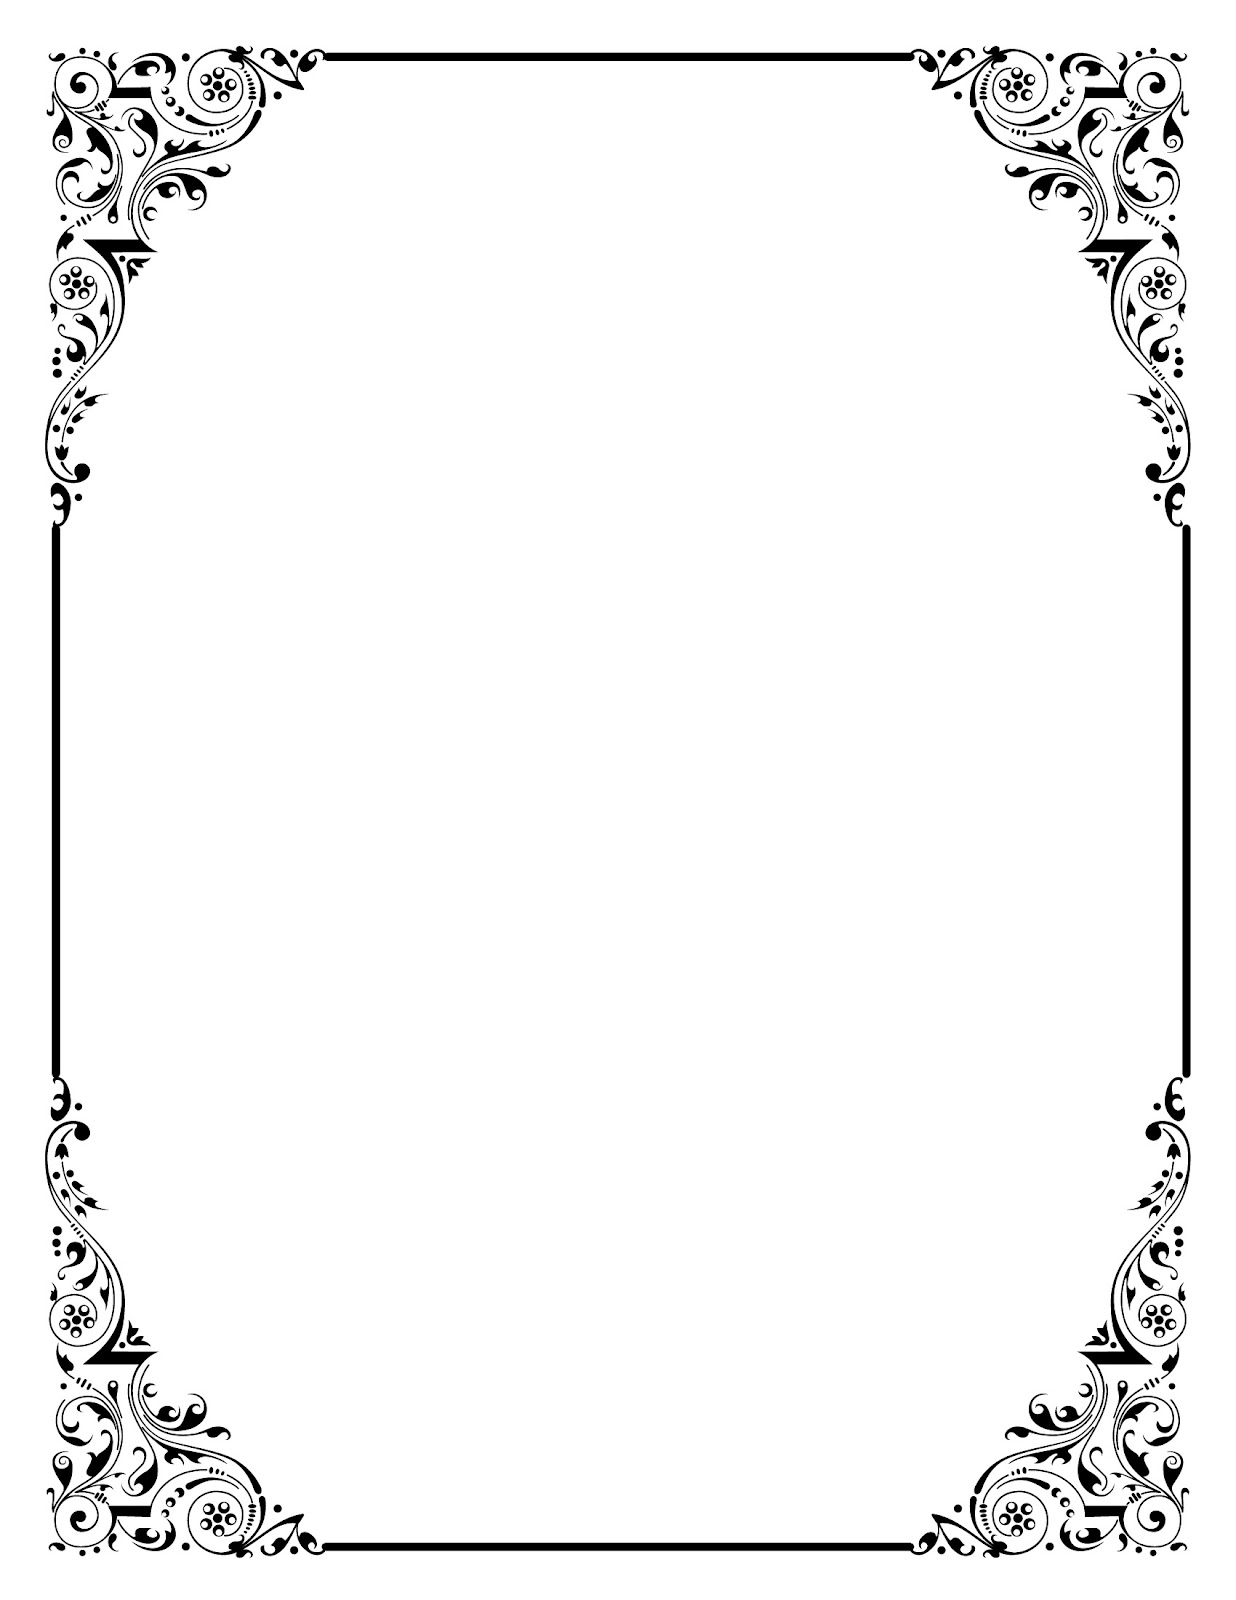 Free Cliparts Classy Ornament, Download Free Clip Art